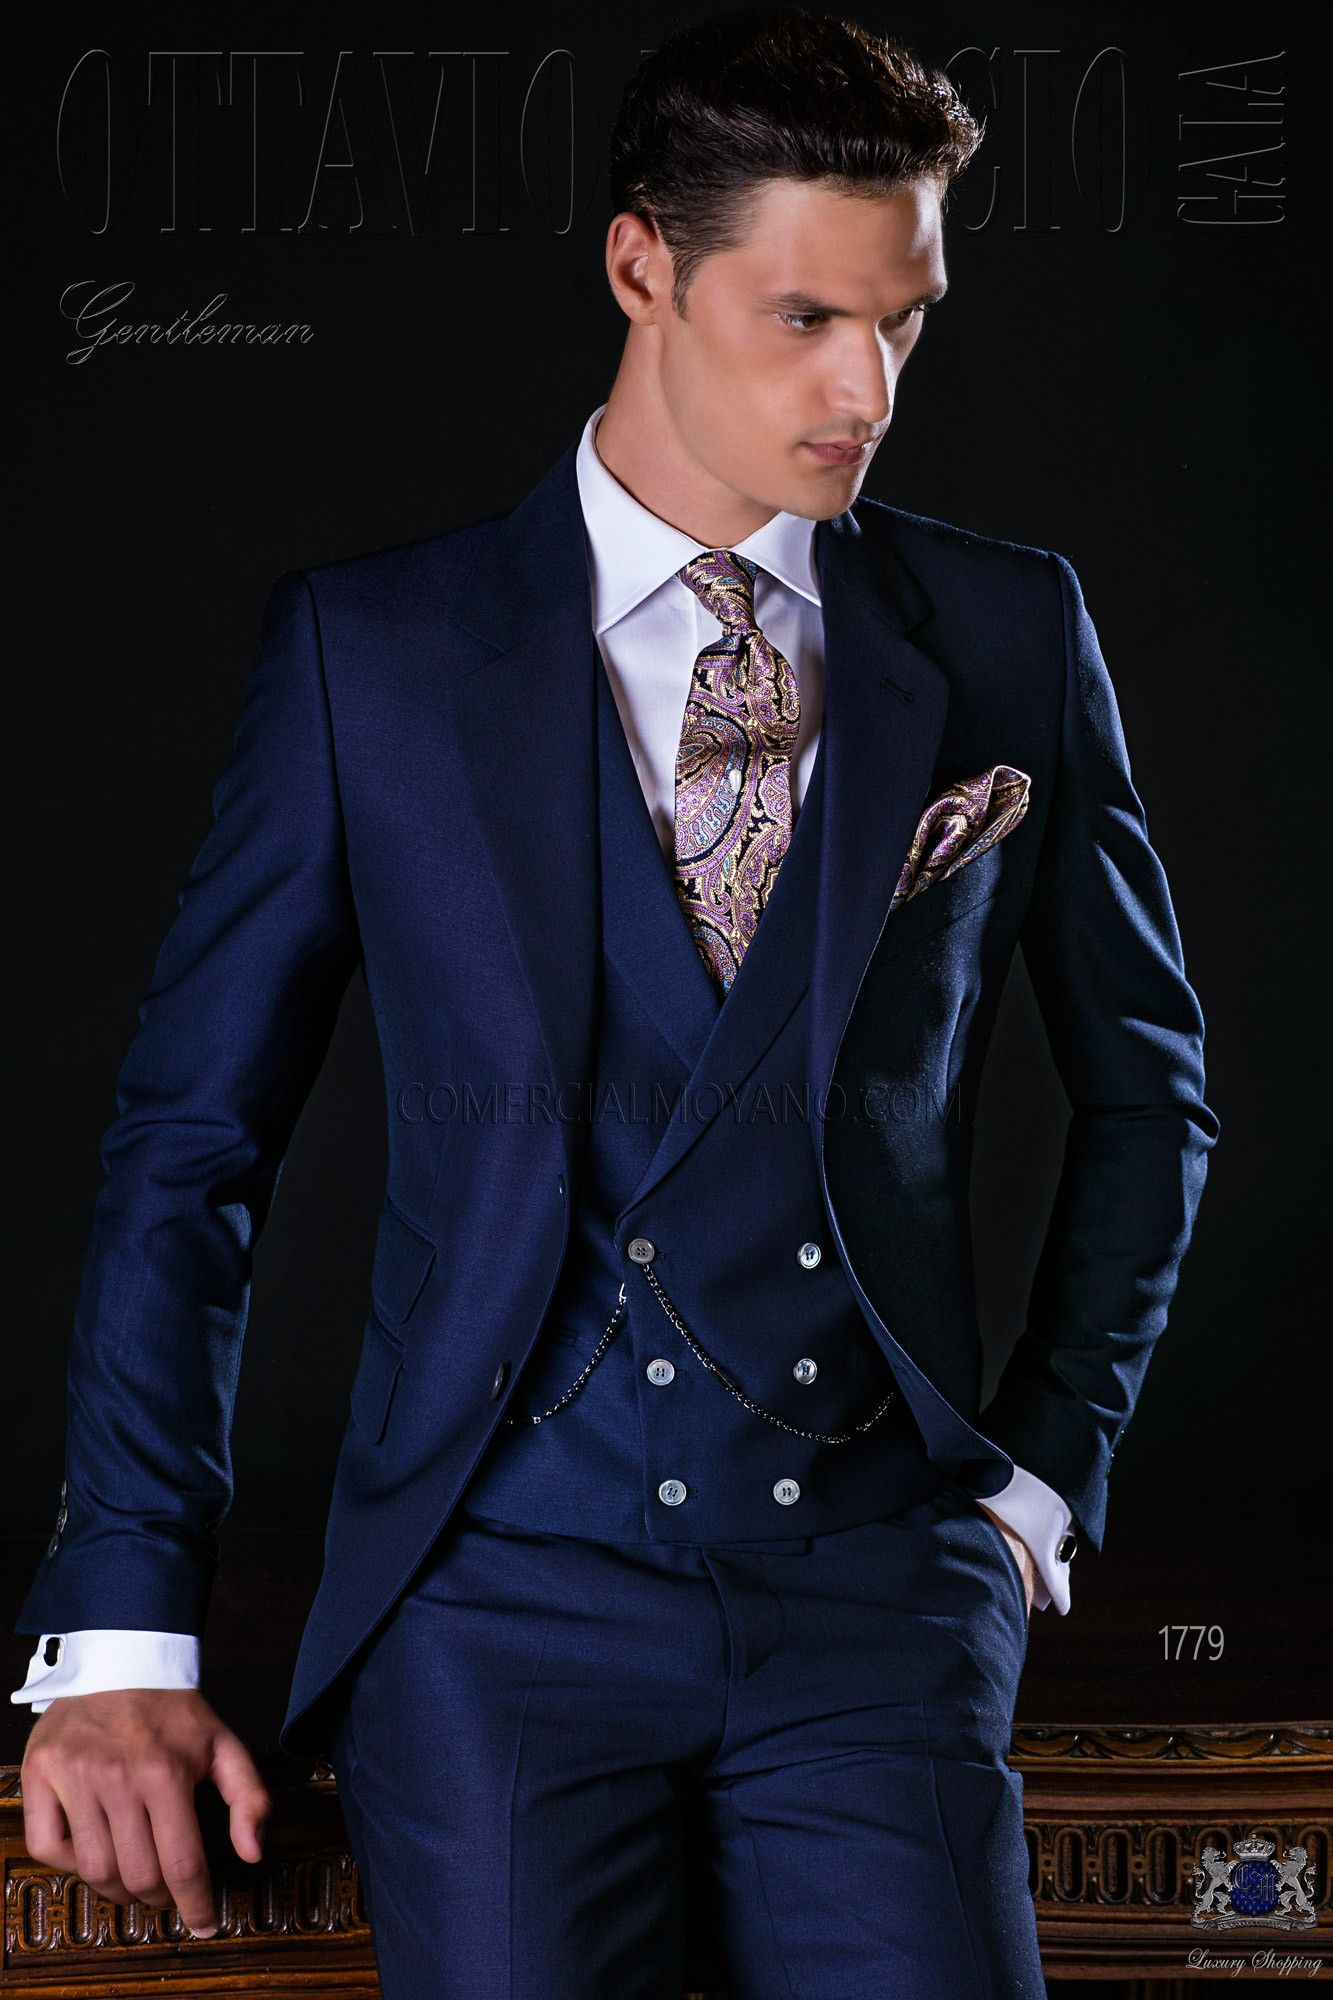 costume homme italien bleu marine avec revers crant s 2 boutons de nacre ticket pocket et 2. Black Bedroom Furniture Sets. Home Design Ideas